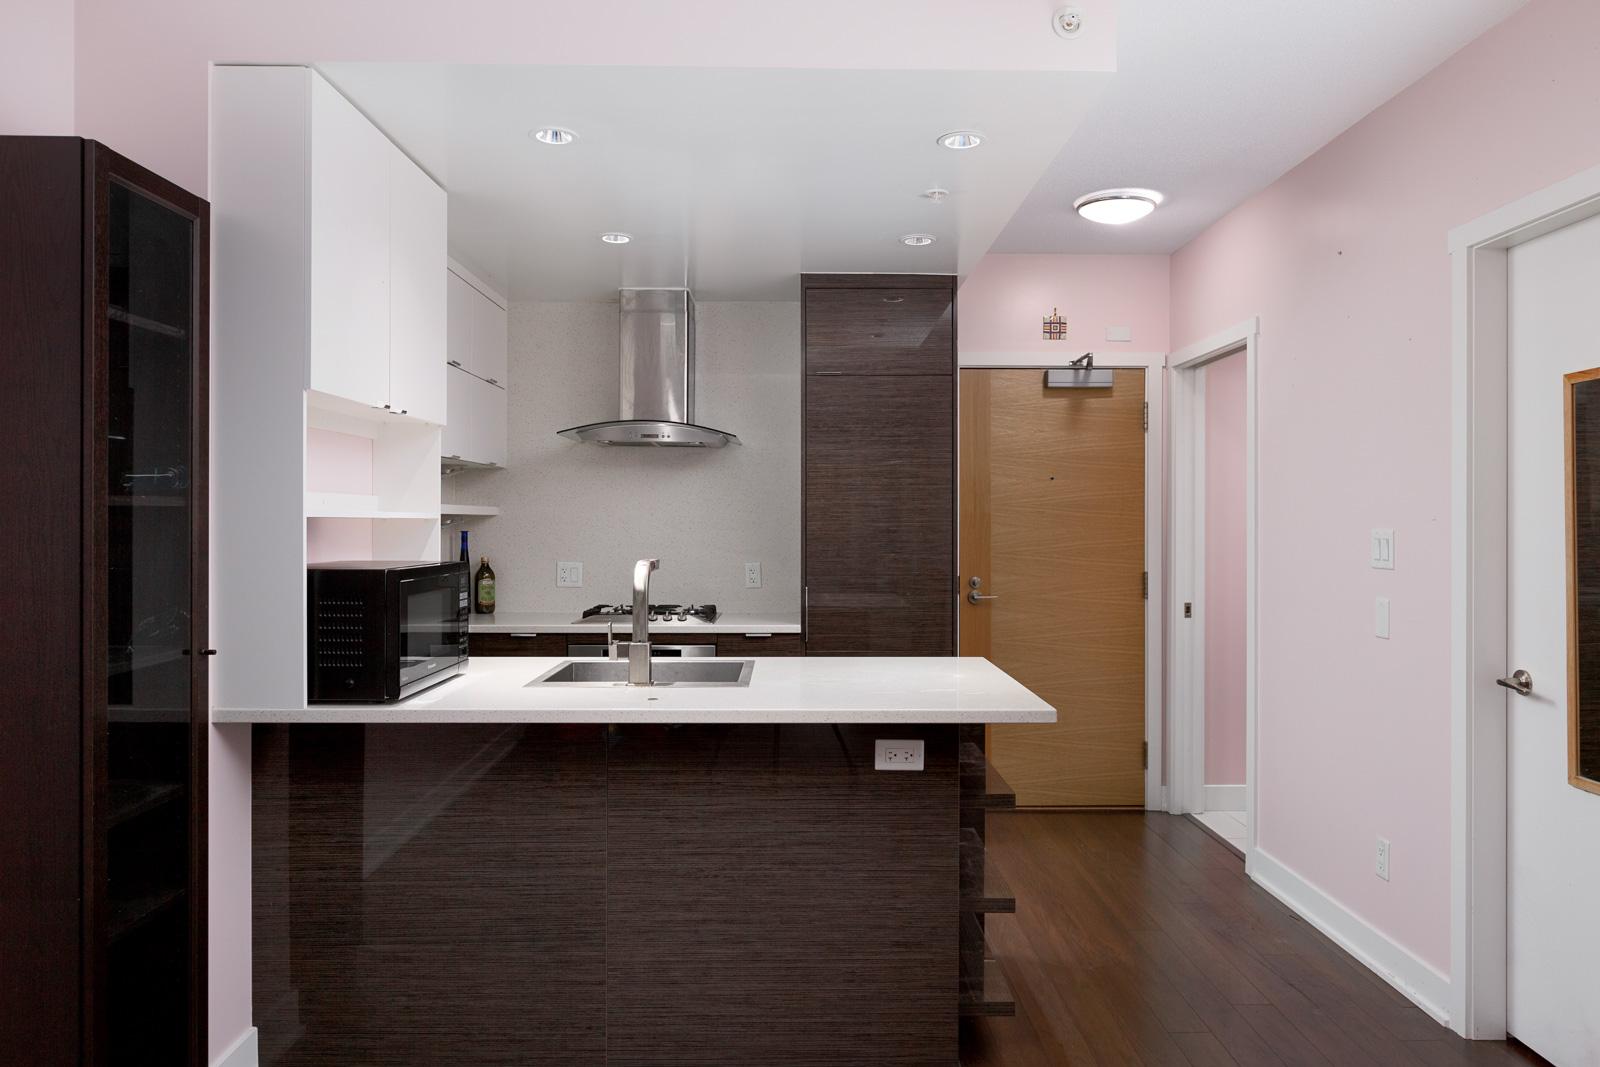 Kitchen with dark hardwood floors in Kits360 condo rental